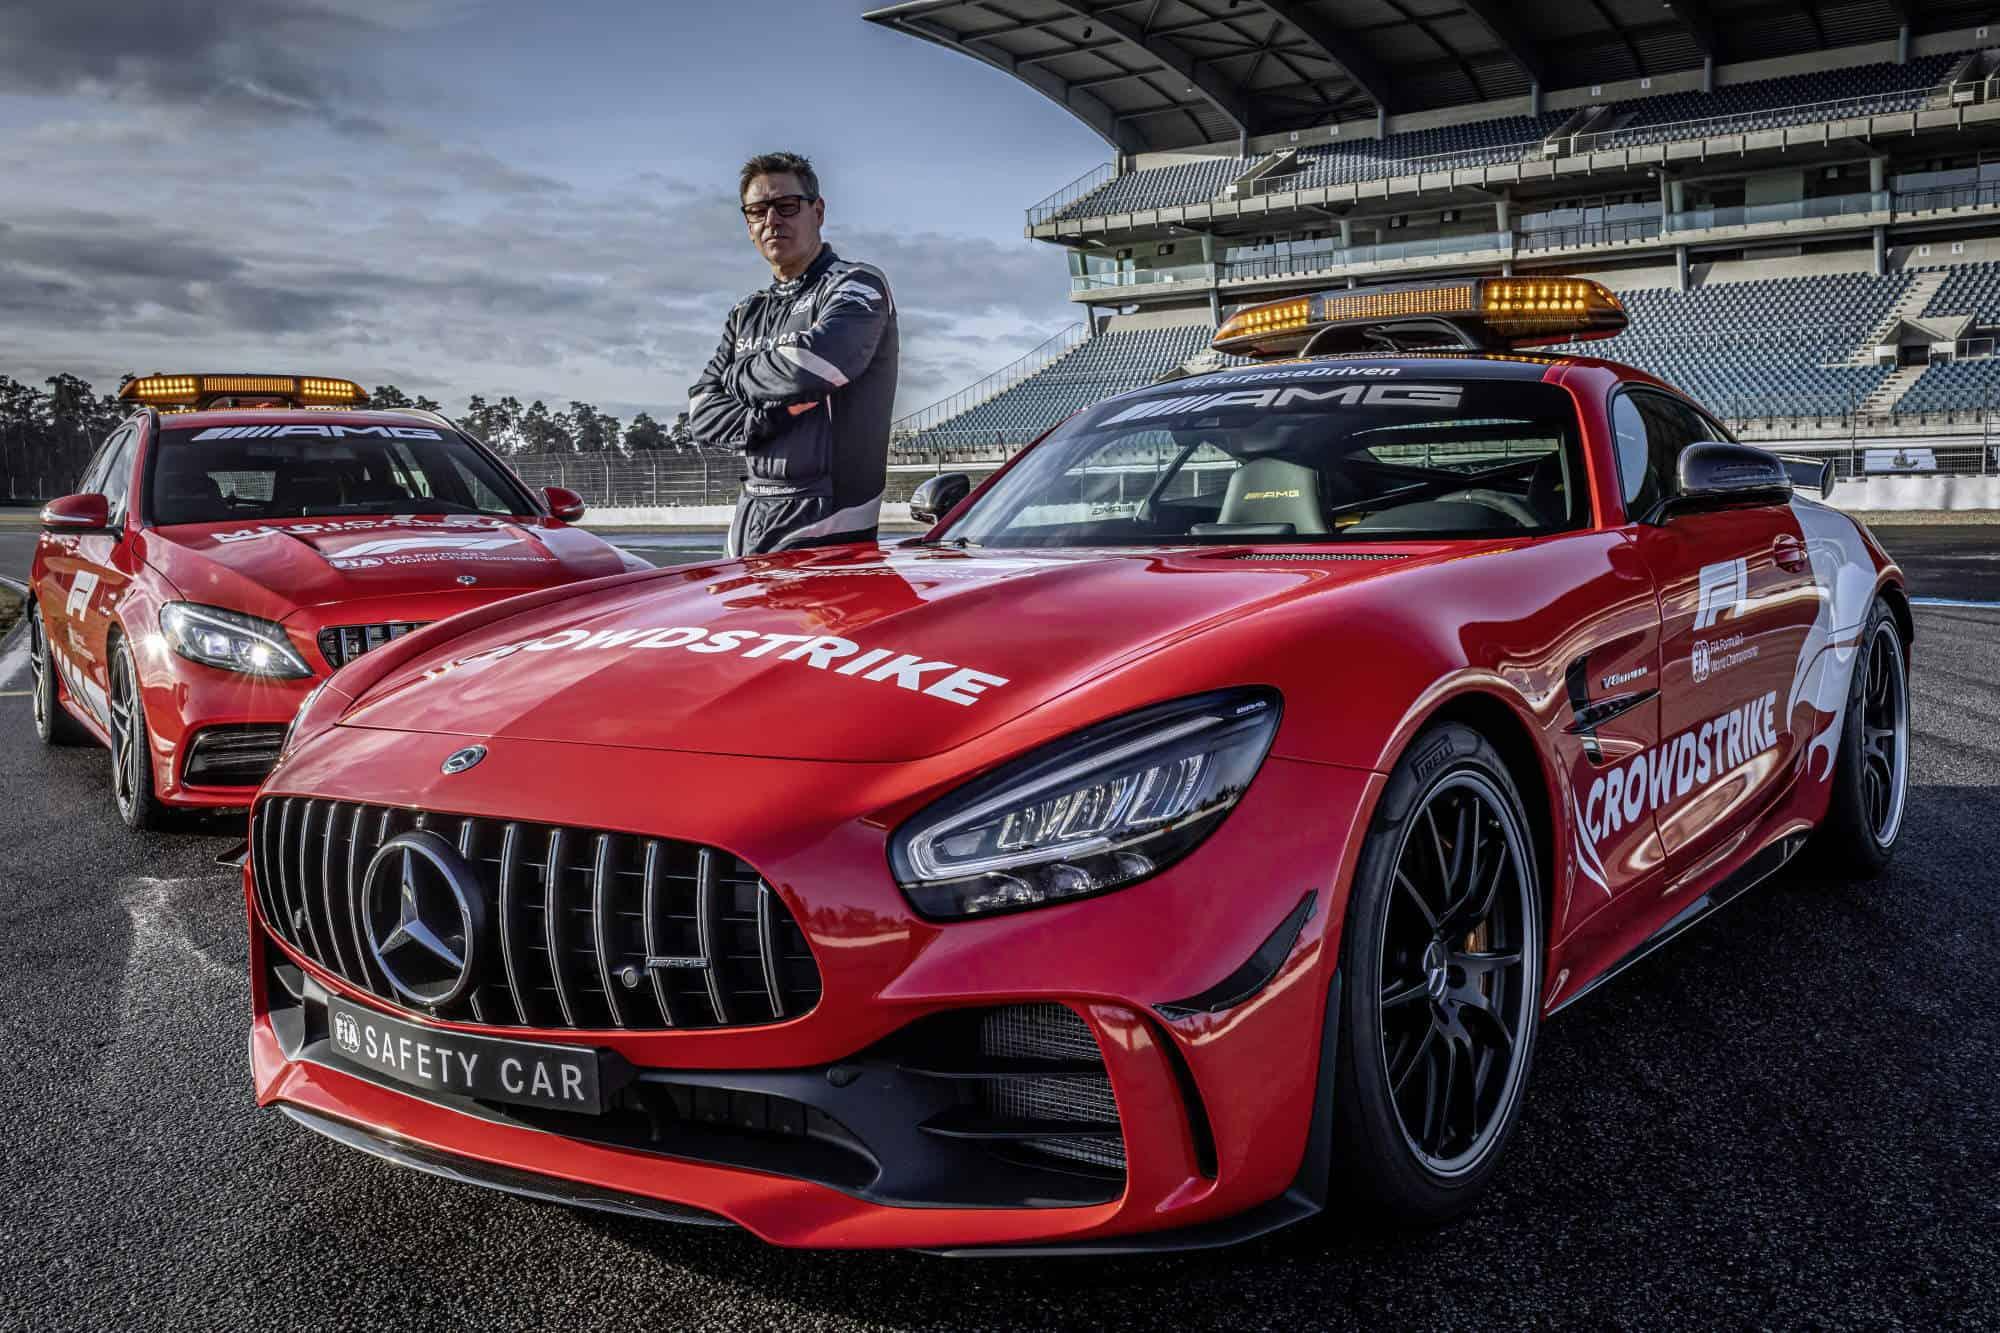 2021 Mercedes safety and medical car 2 Photo Daimler